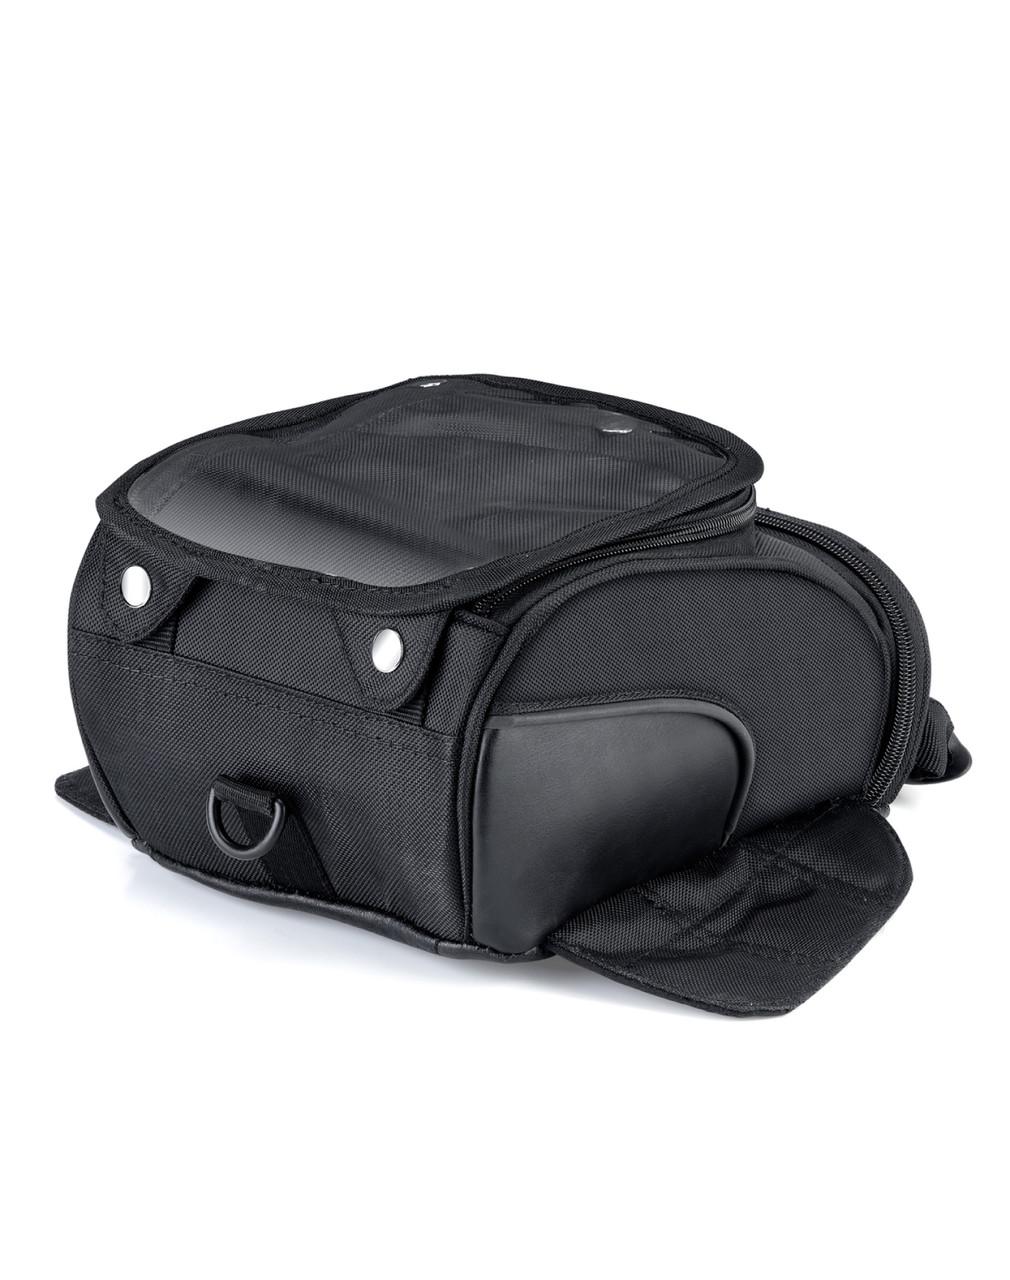 VikingBags AXE Medium Black Magnetic Motorcycle Tank Bag Back View